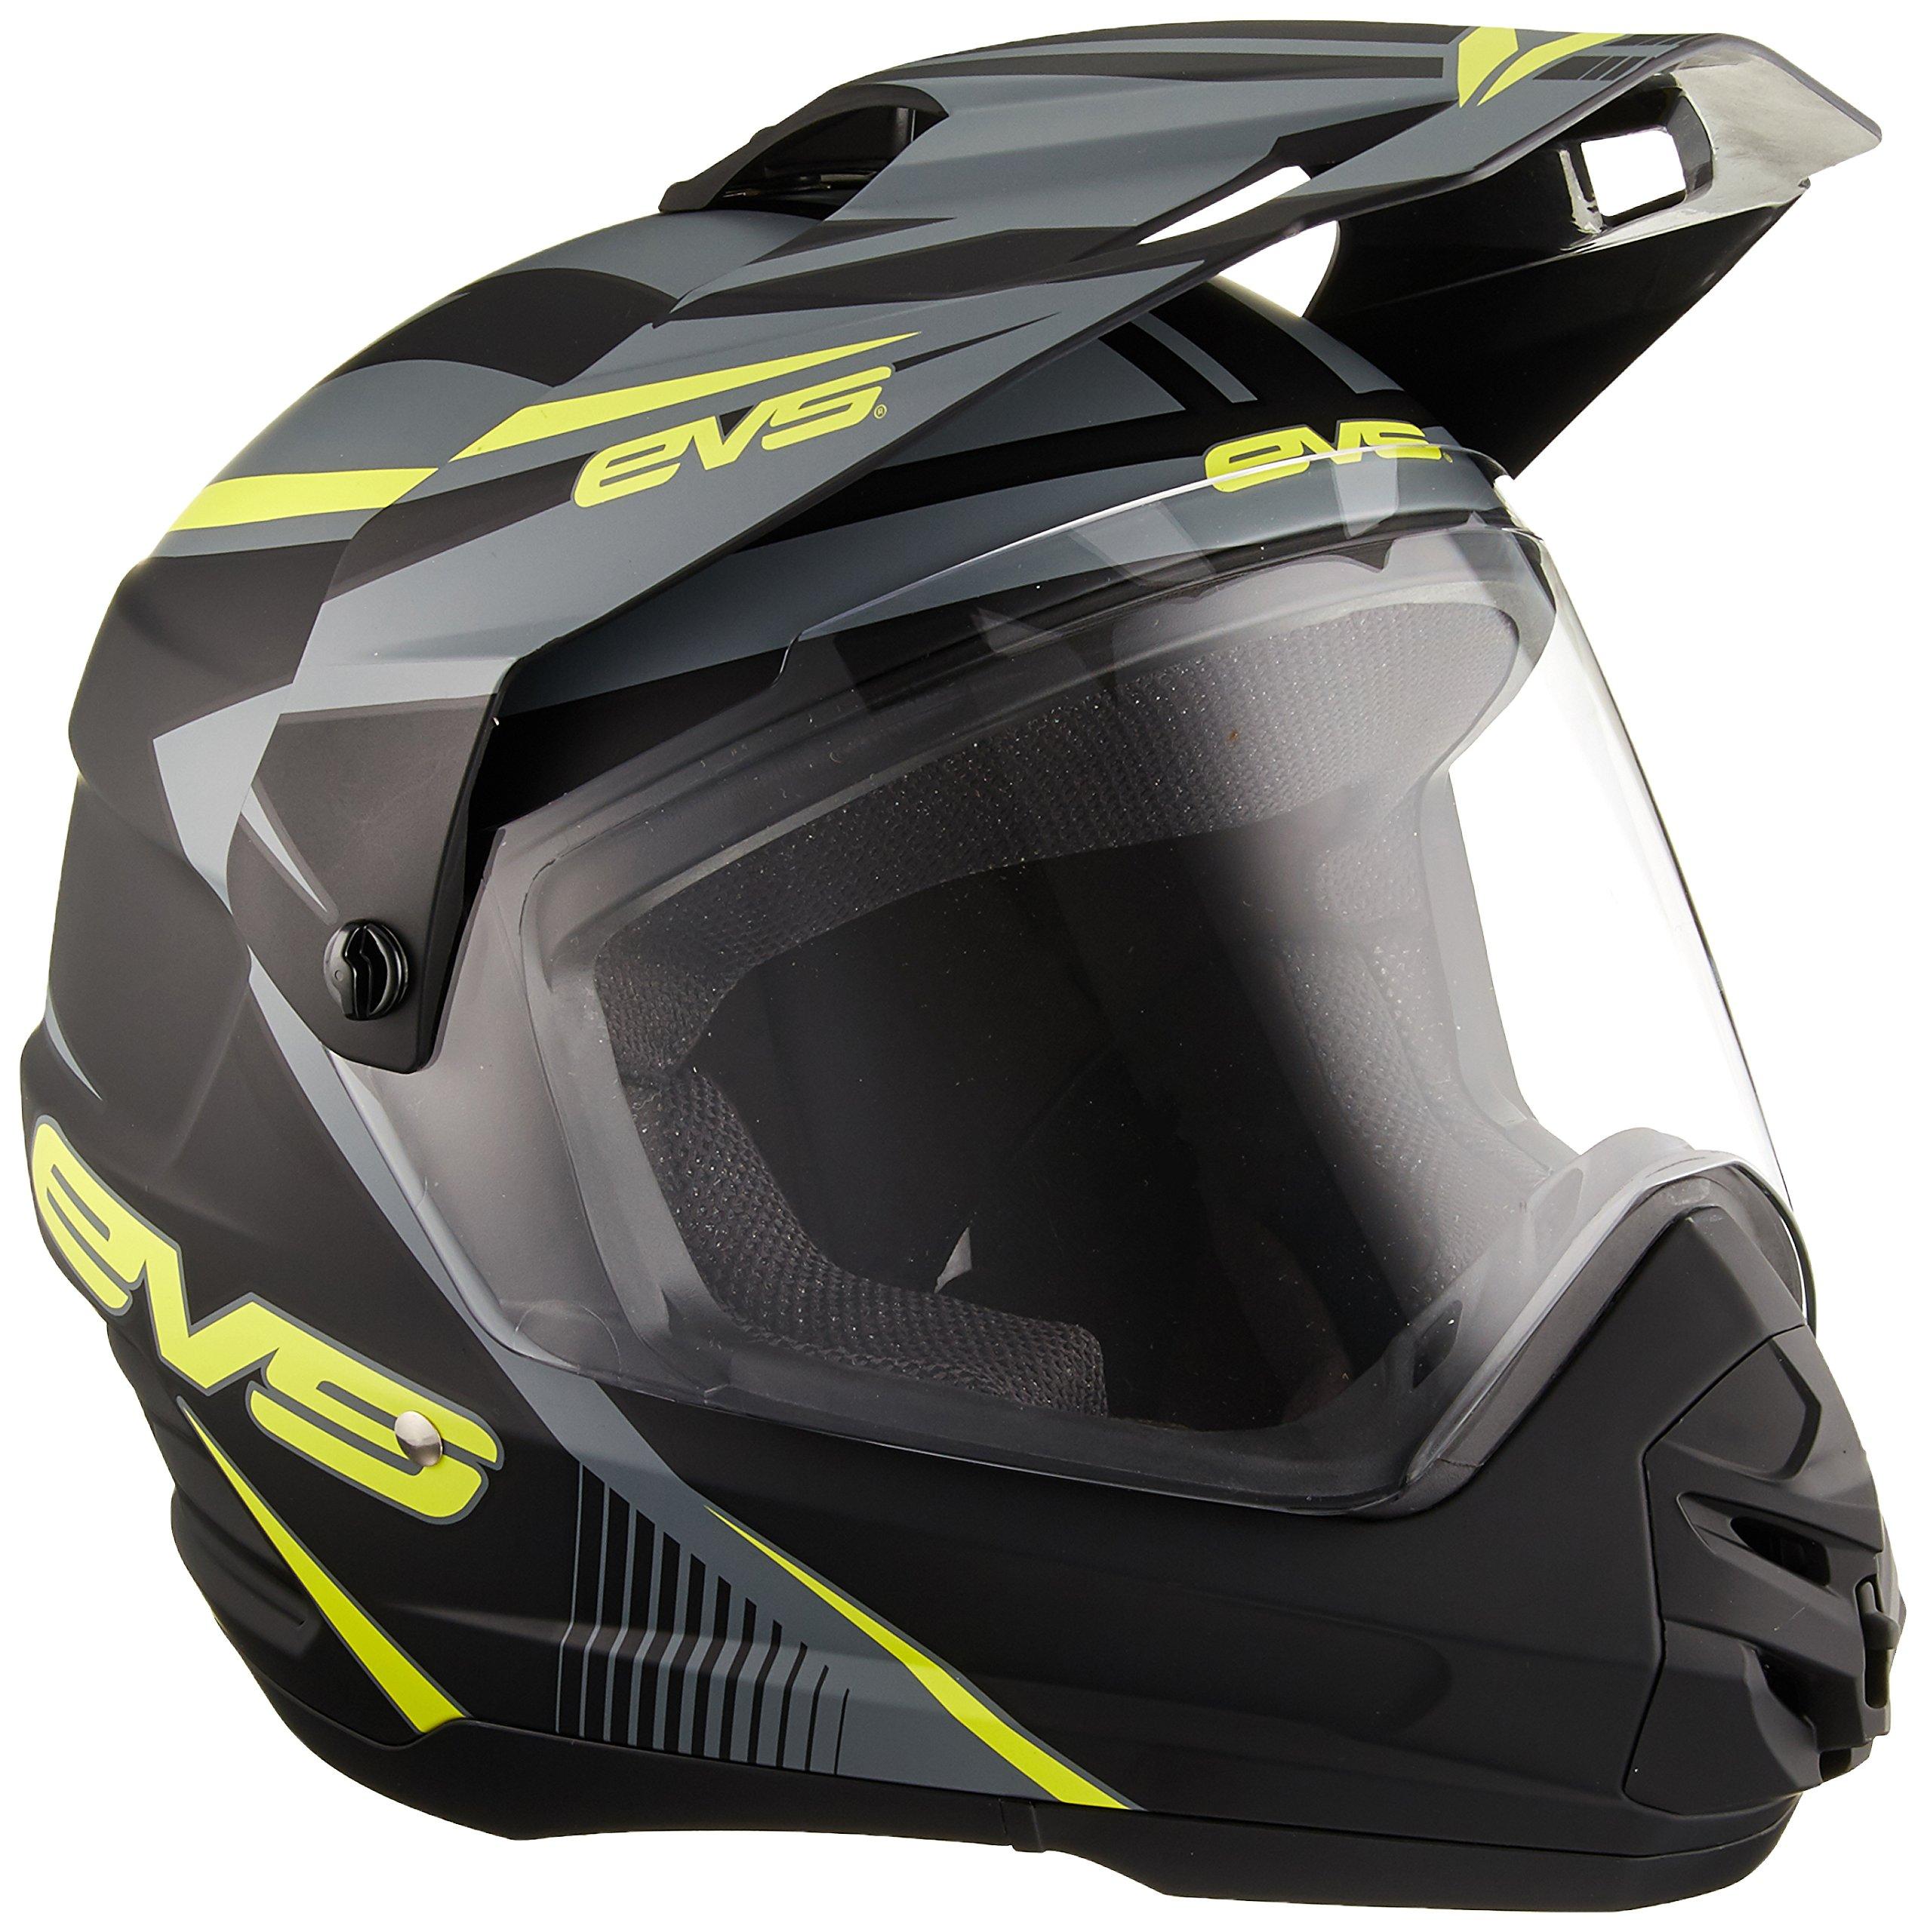 EVS Sports T5 Dual Sport Venture Helmet (Matte Black/Hi-Viz Yellow, Medium)